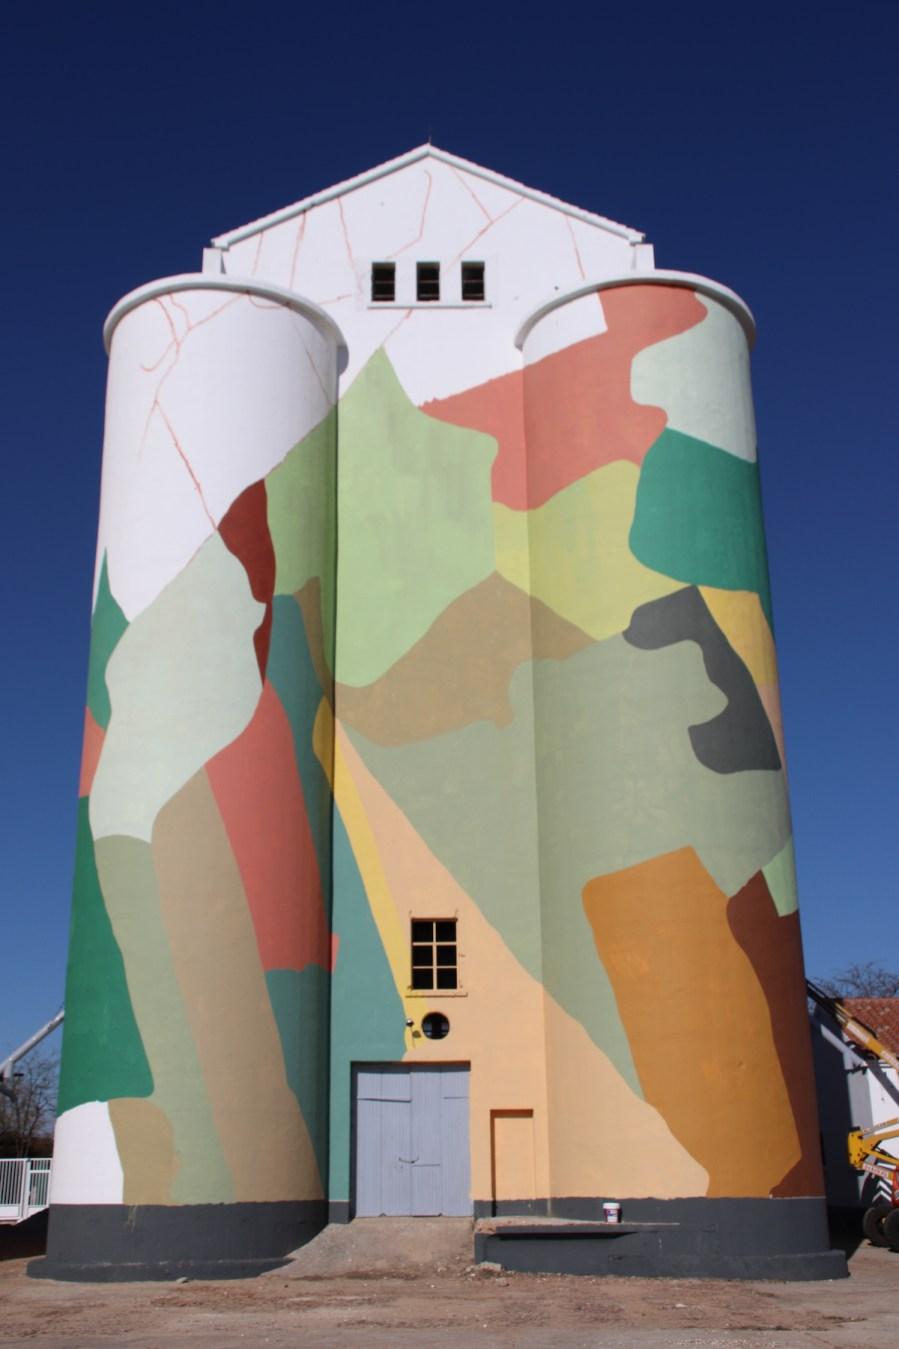 Equipo-Plástico-titanes-street-art-silos-Ciudad-Real-pc-ink-and-movement-1